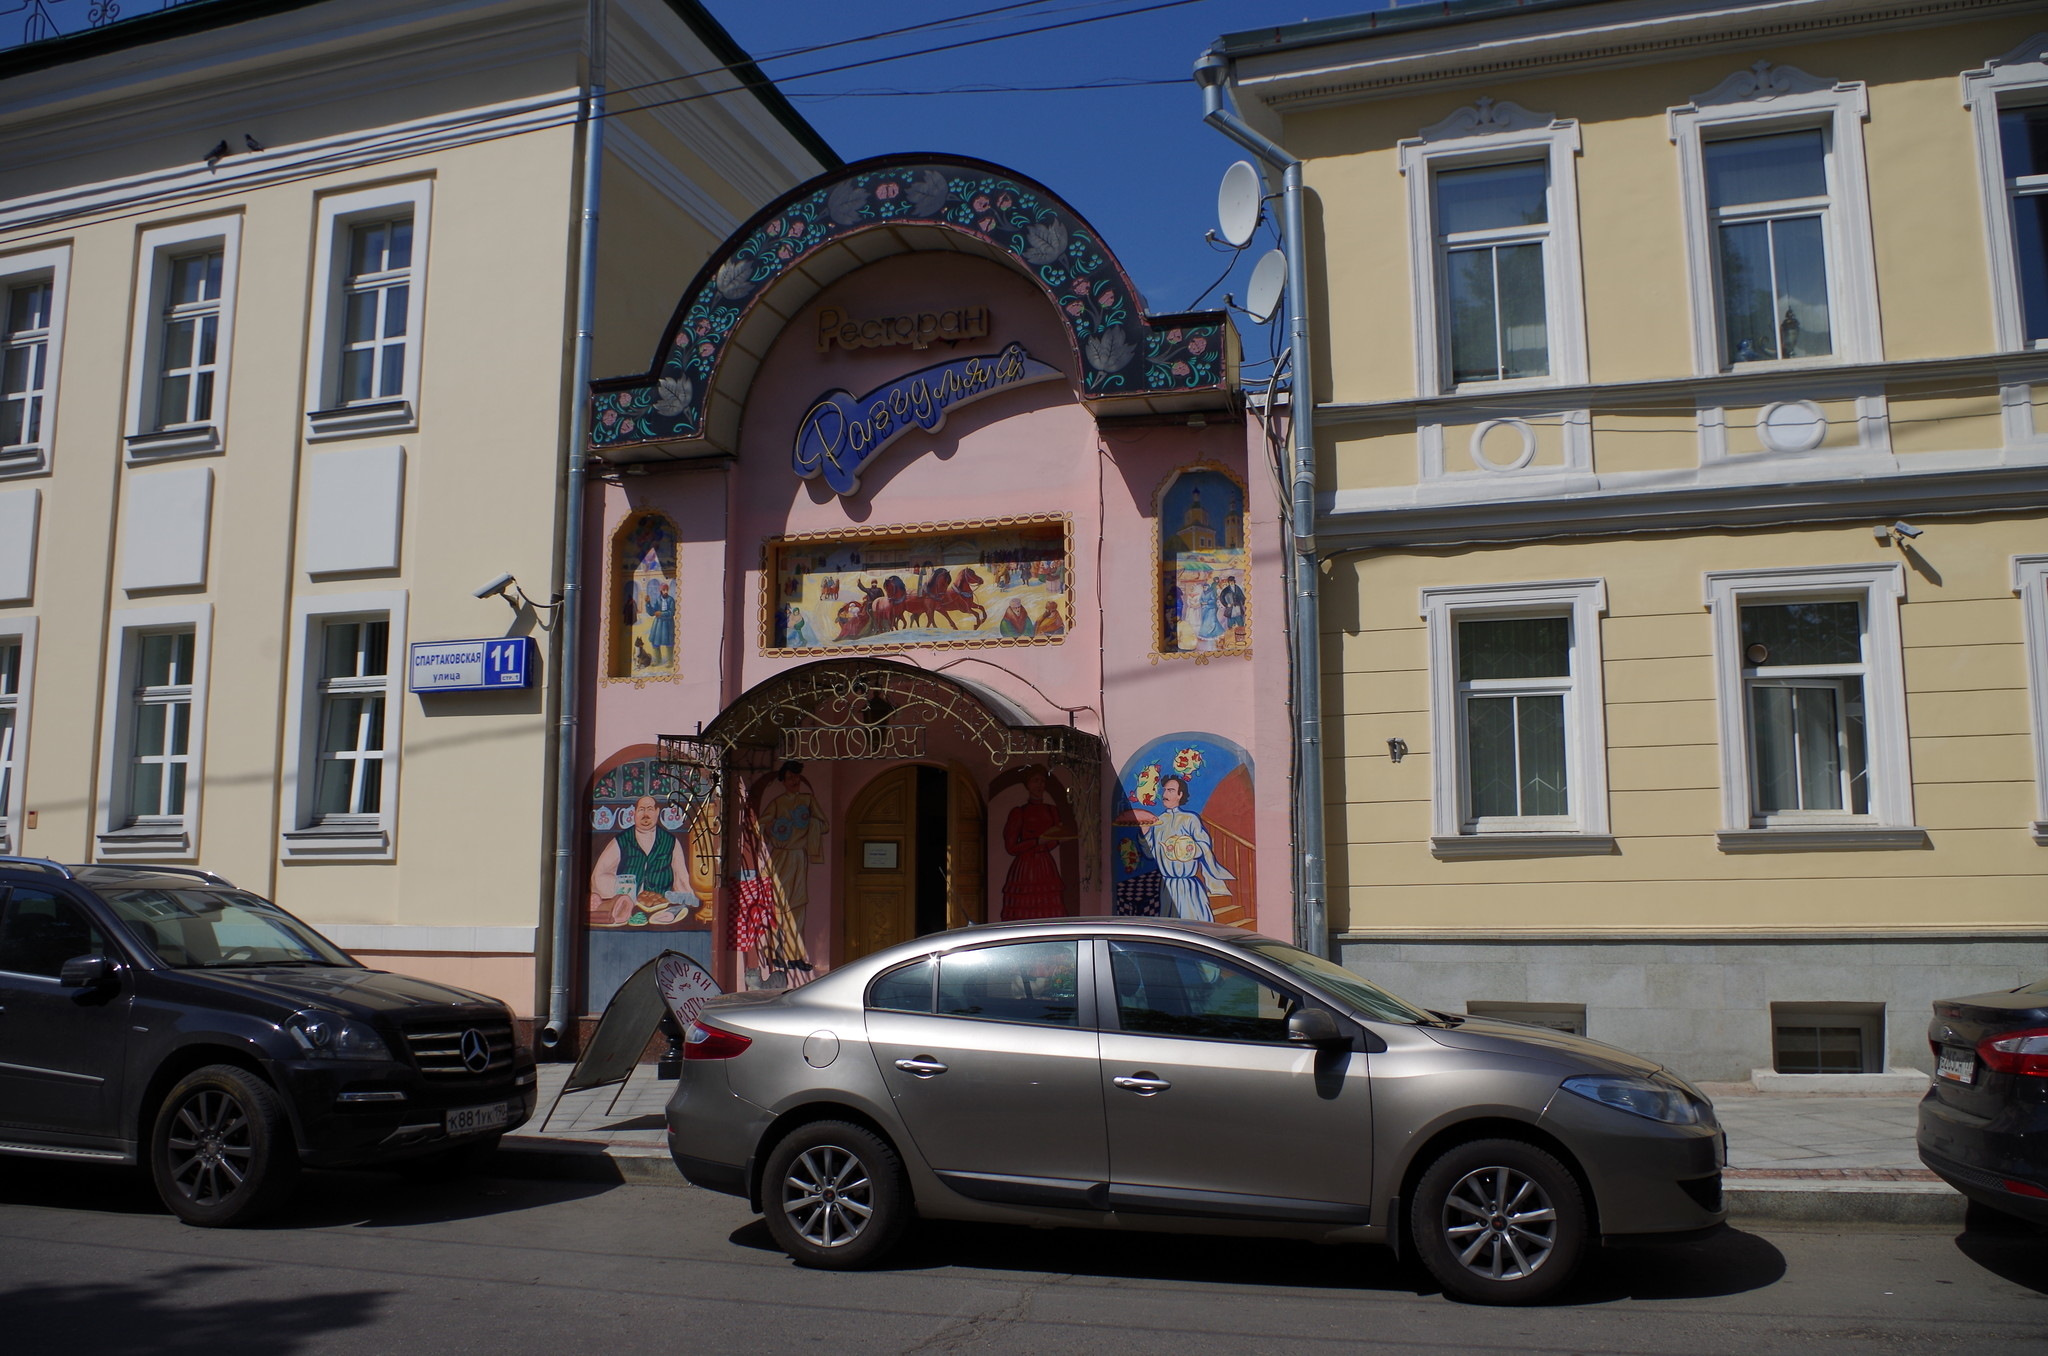 Ресторан «Разгуляй» (Спартаковская улица, дом 11)